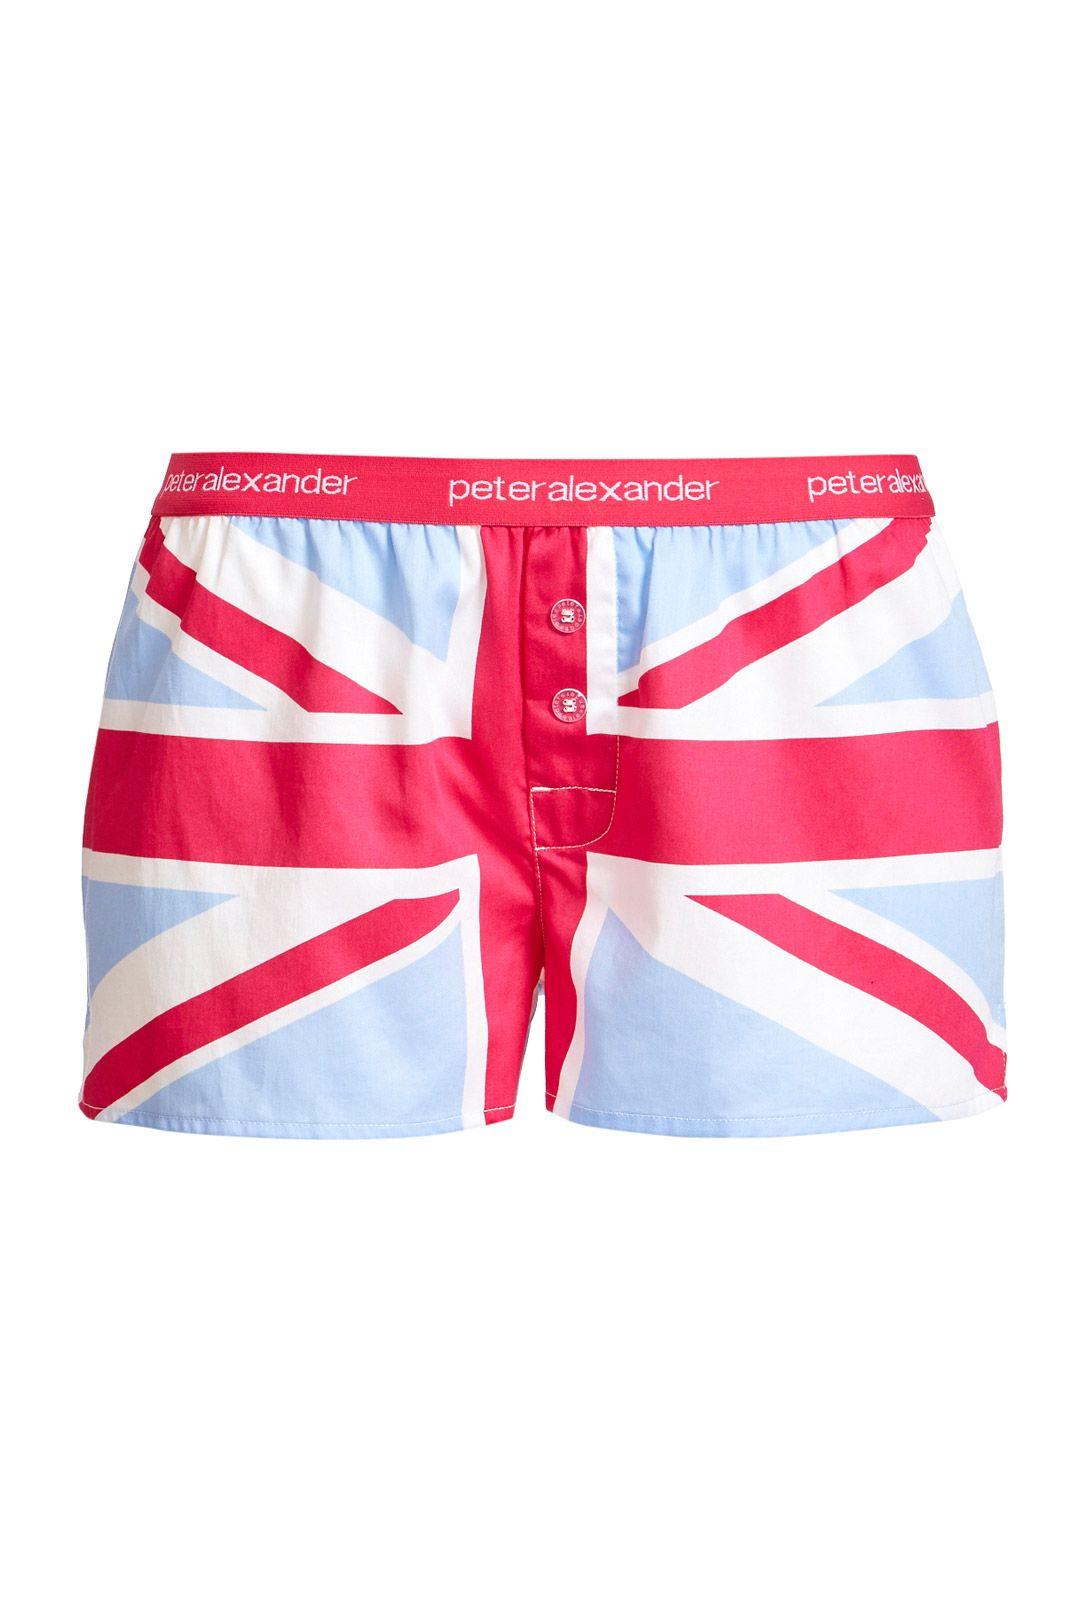 Union Jack Mini Short Peter Alexander Pajamas Women